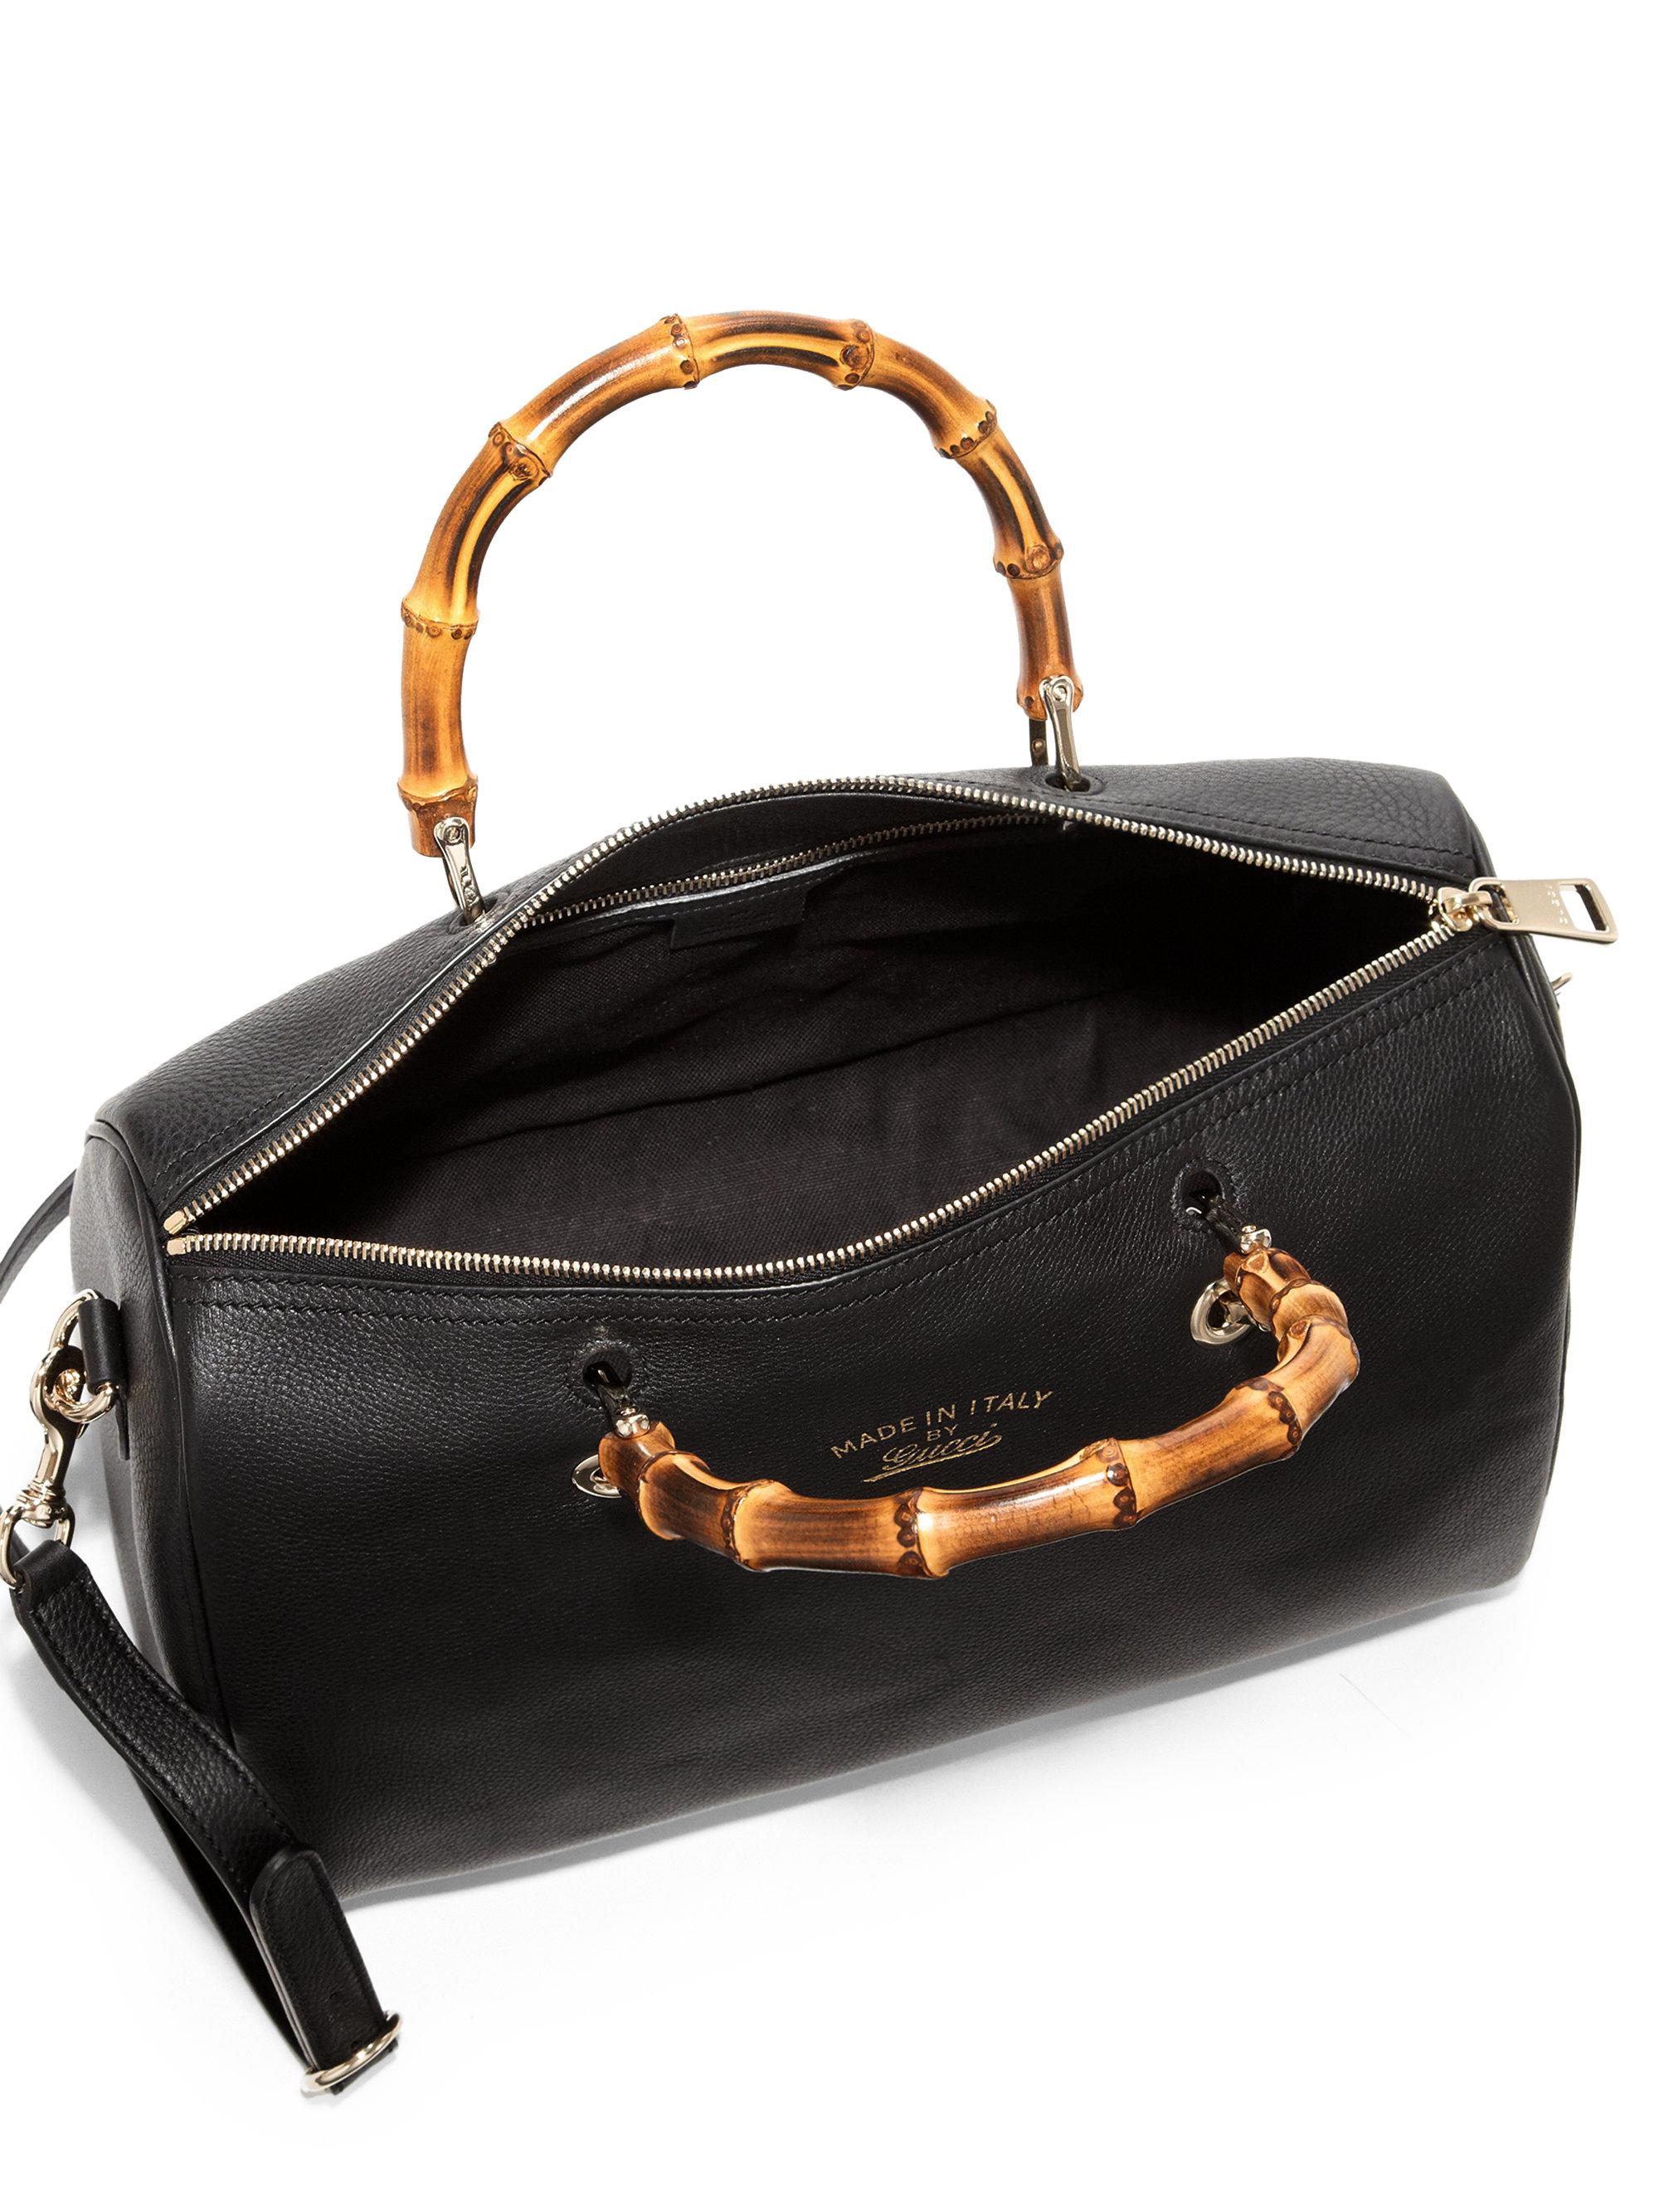 lyst gucci bamboo shopper boston bag in black. Black Bedroom Furniture Sets. Home Design Ideas